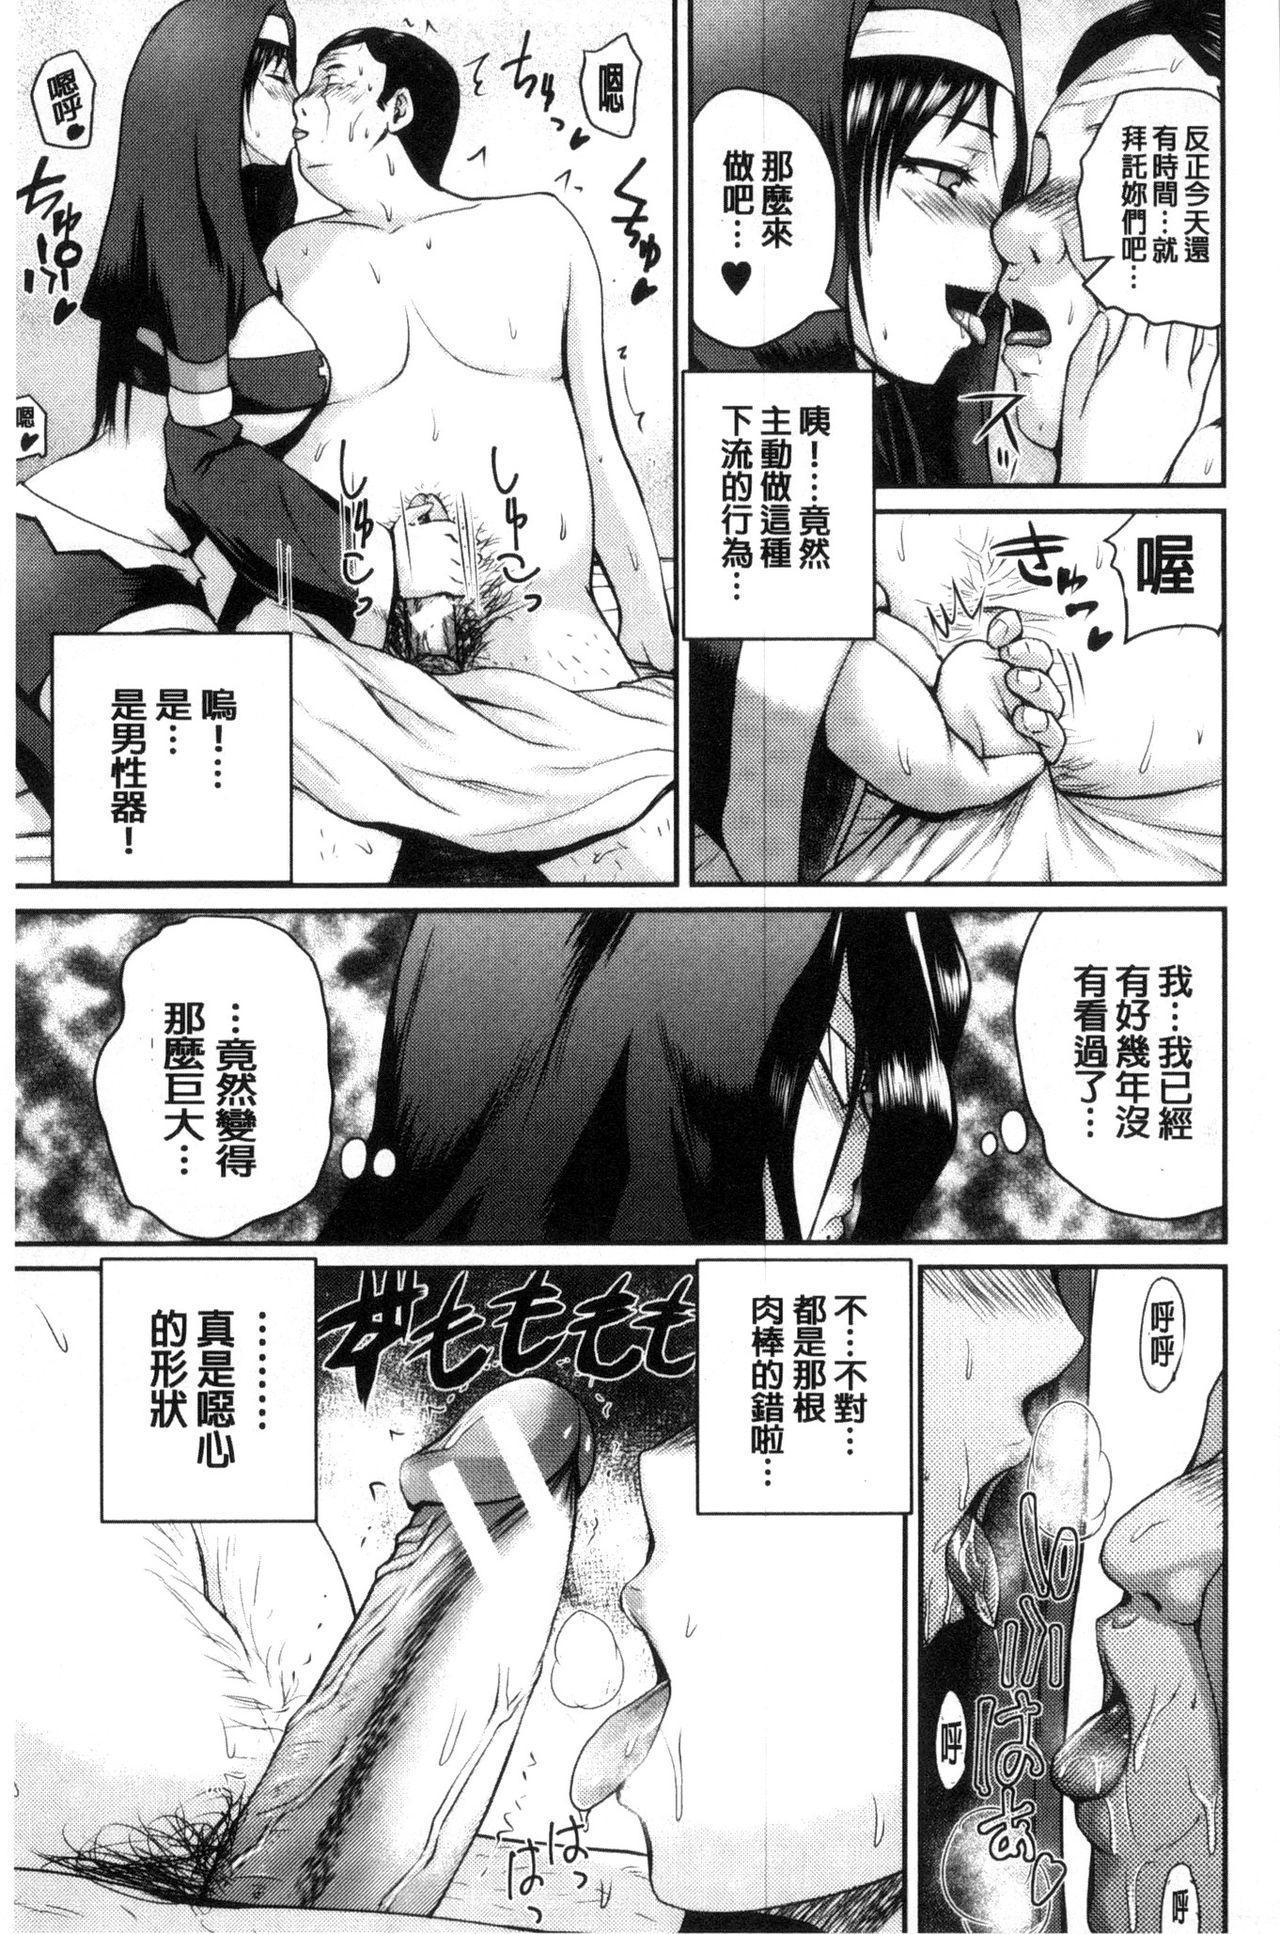 Opink Health Seibo no Fukuin 39